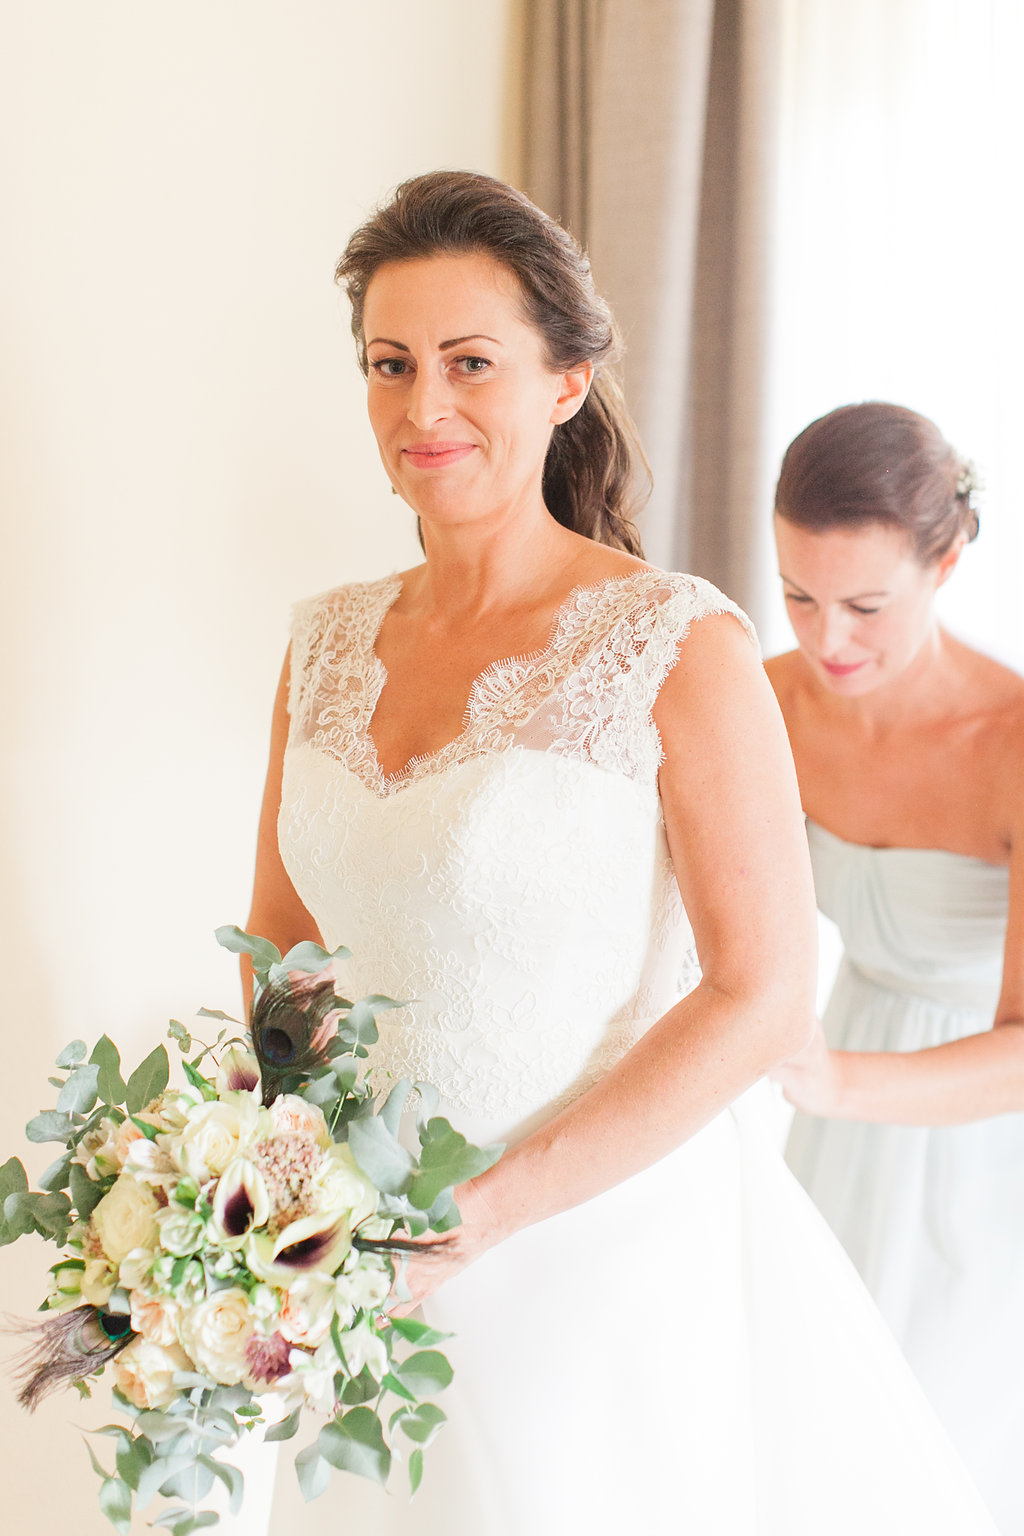 castelfalfi-tuscany-wedding-photographer-roberta-facchini-89